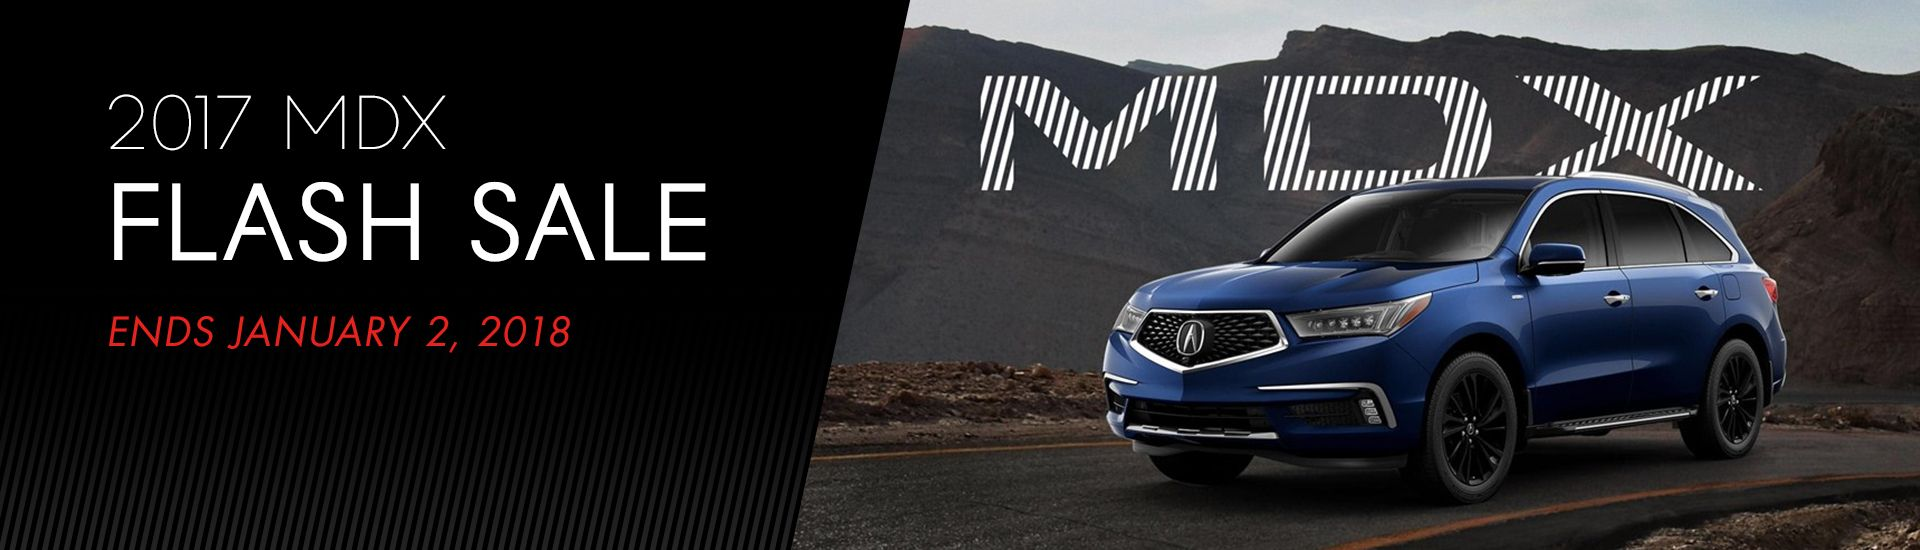 Acura MDX Sales Bedford Ohio